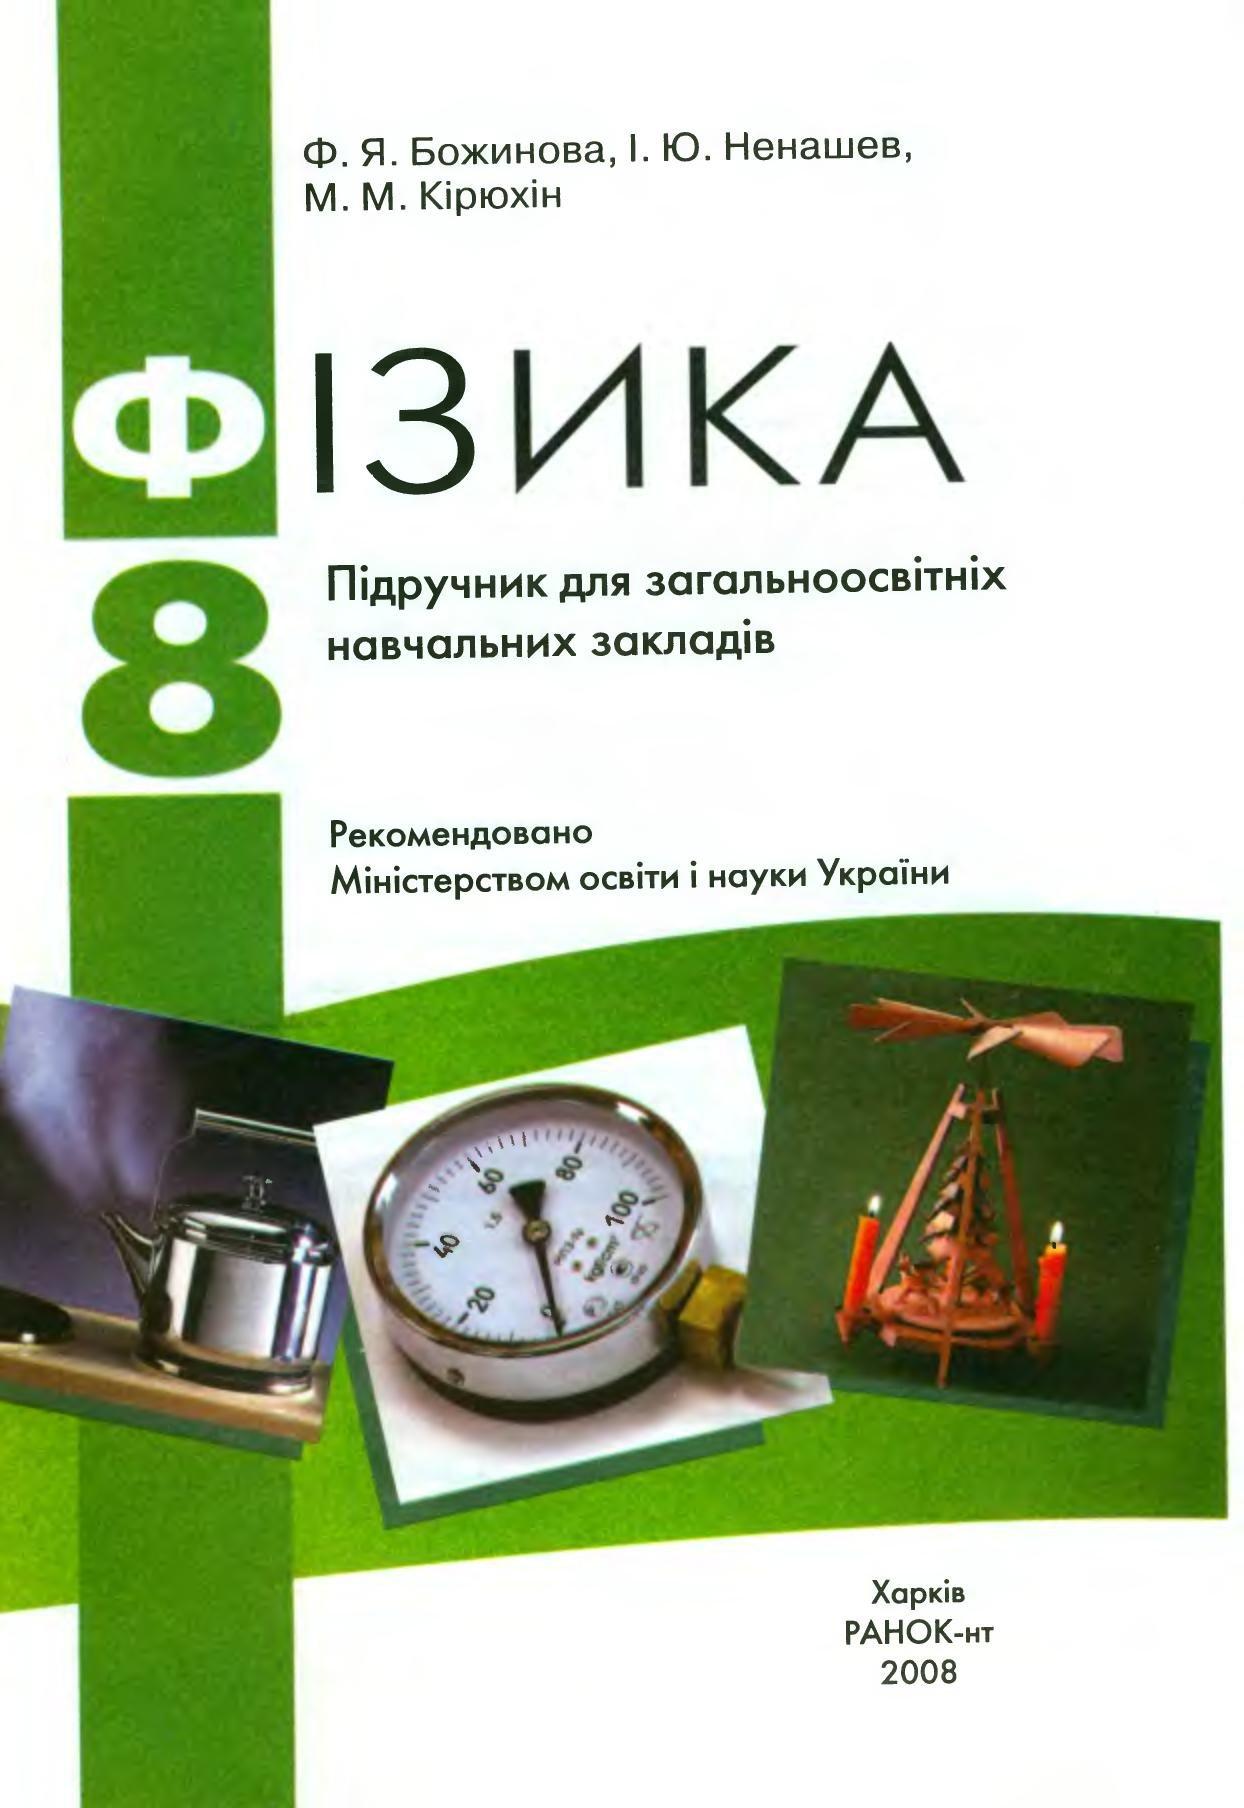 Фізика 8 клас коршак ляшенко савченко решебник лабораторна 7 онлайн бесплатно